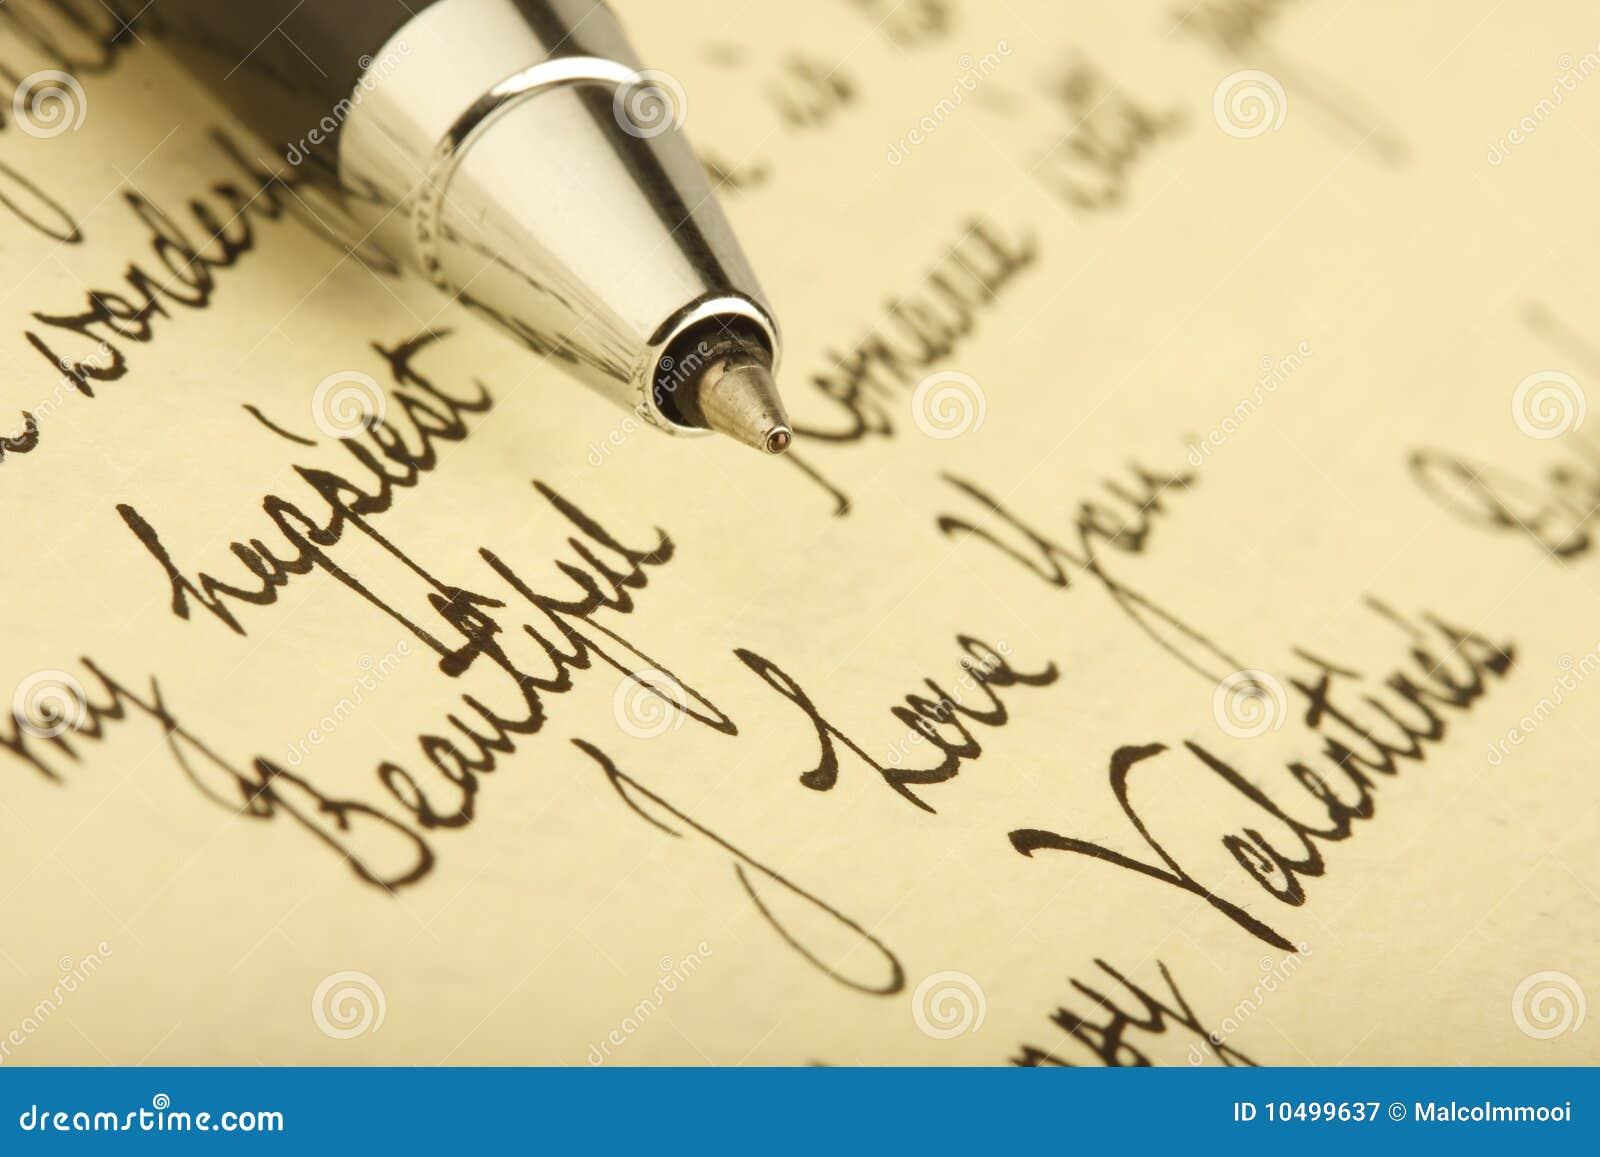 Te Amo Escrito En Pluma En La Arena Imagen De Archivo: Carta De Amor Imagen De Archivo. Imagen De Amor, Romance